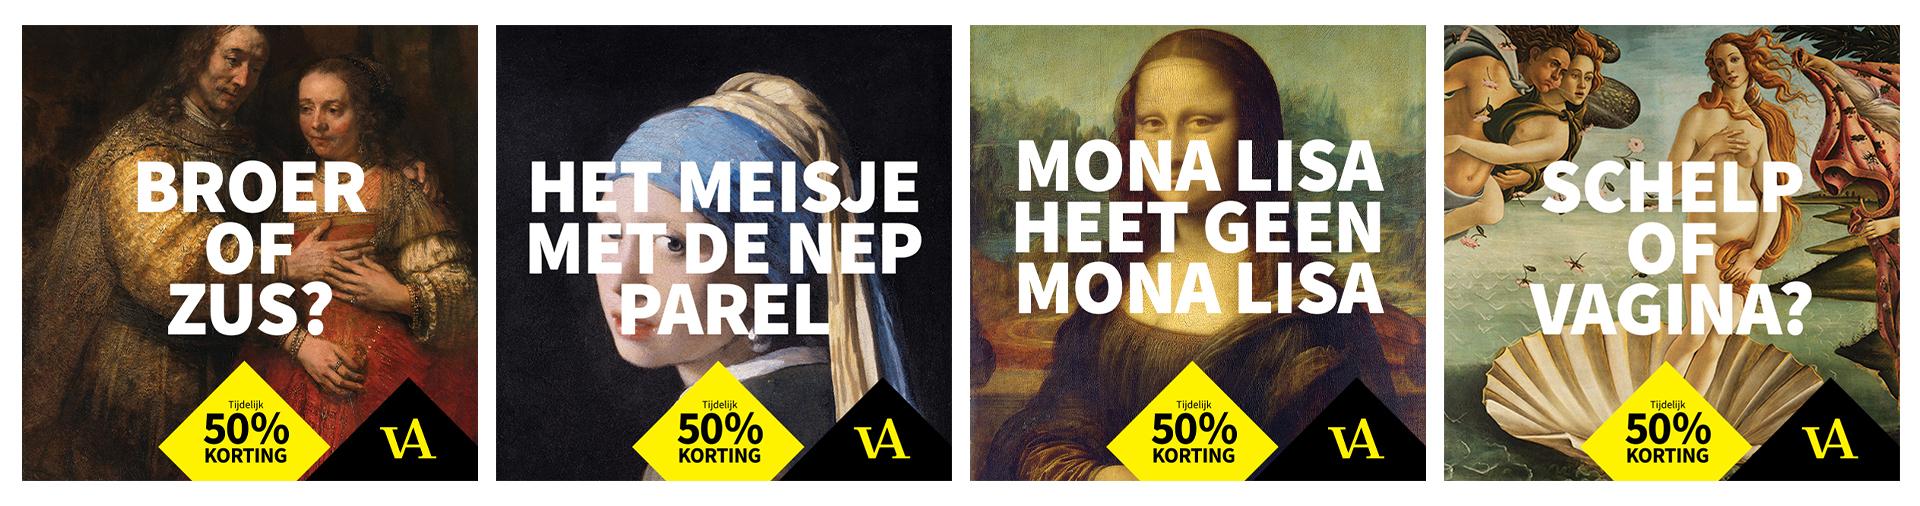 Mona_lisa_amsterdam_groot